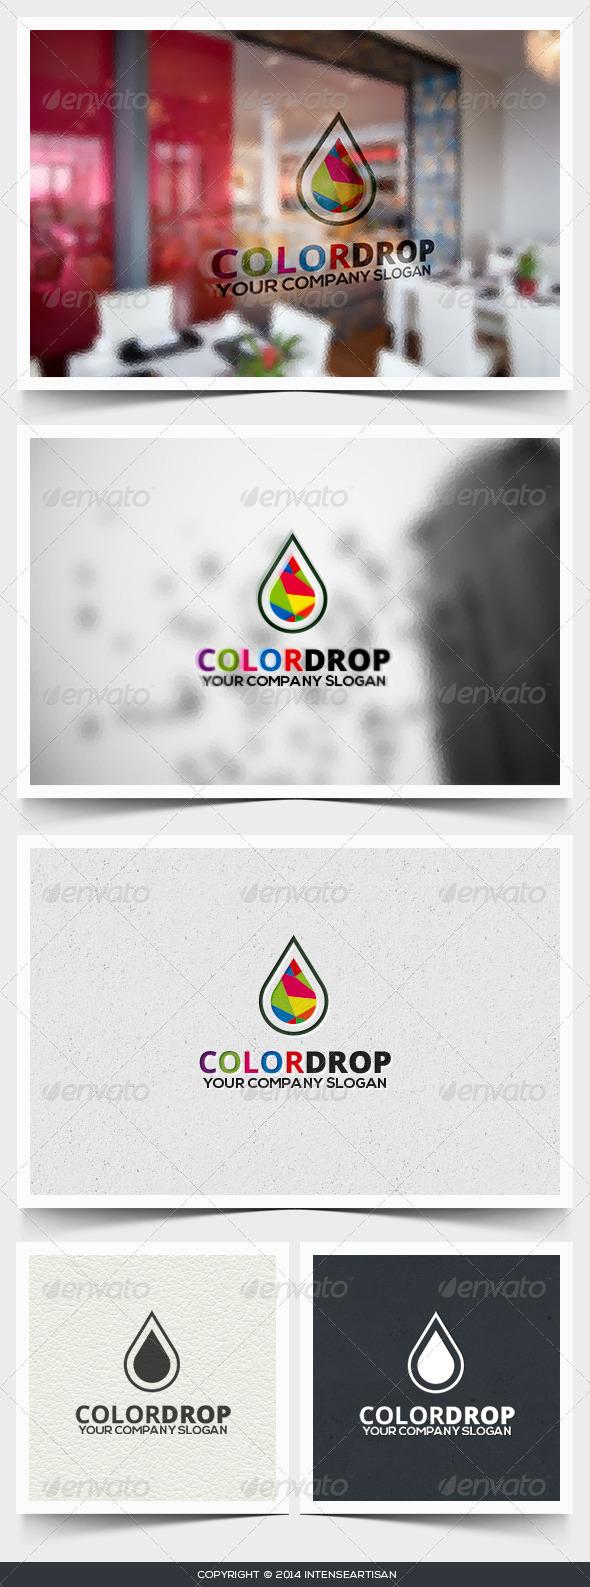 Color Drop Logo Template - Nature Logo Templates